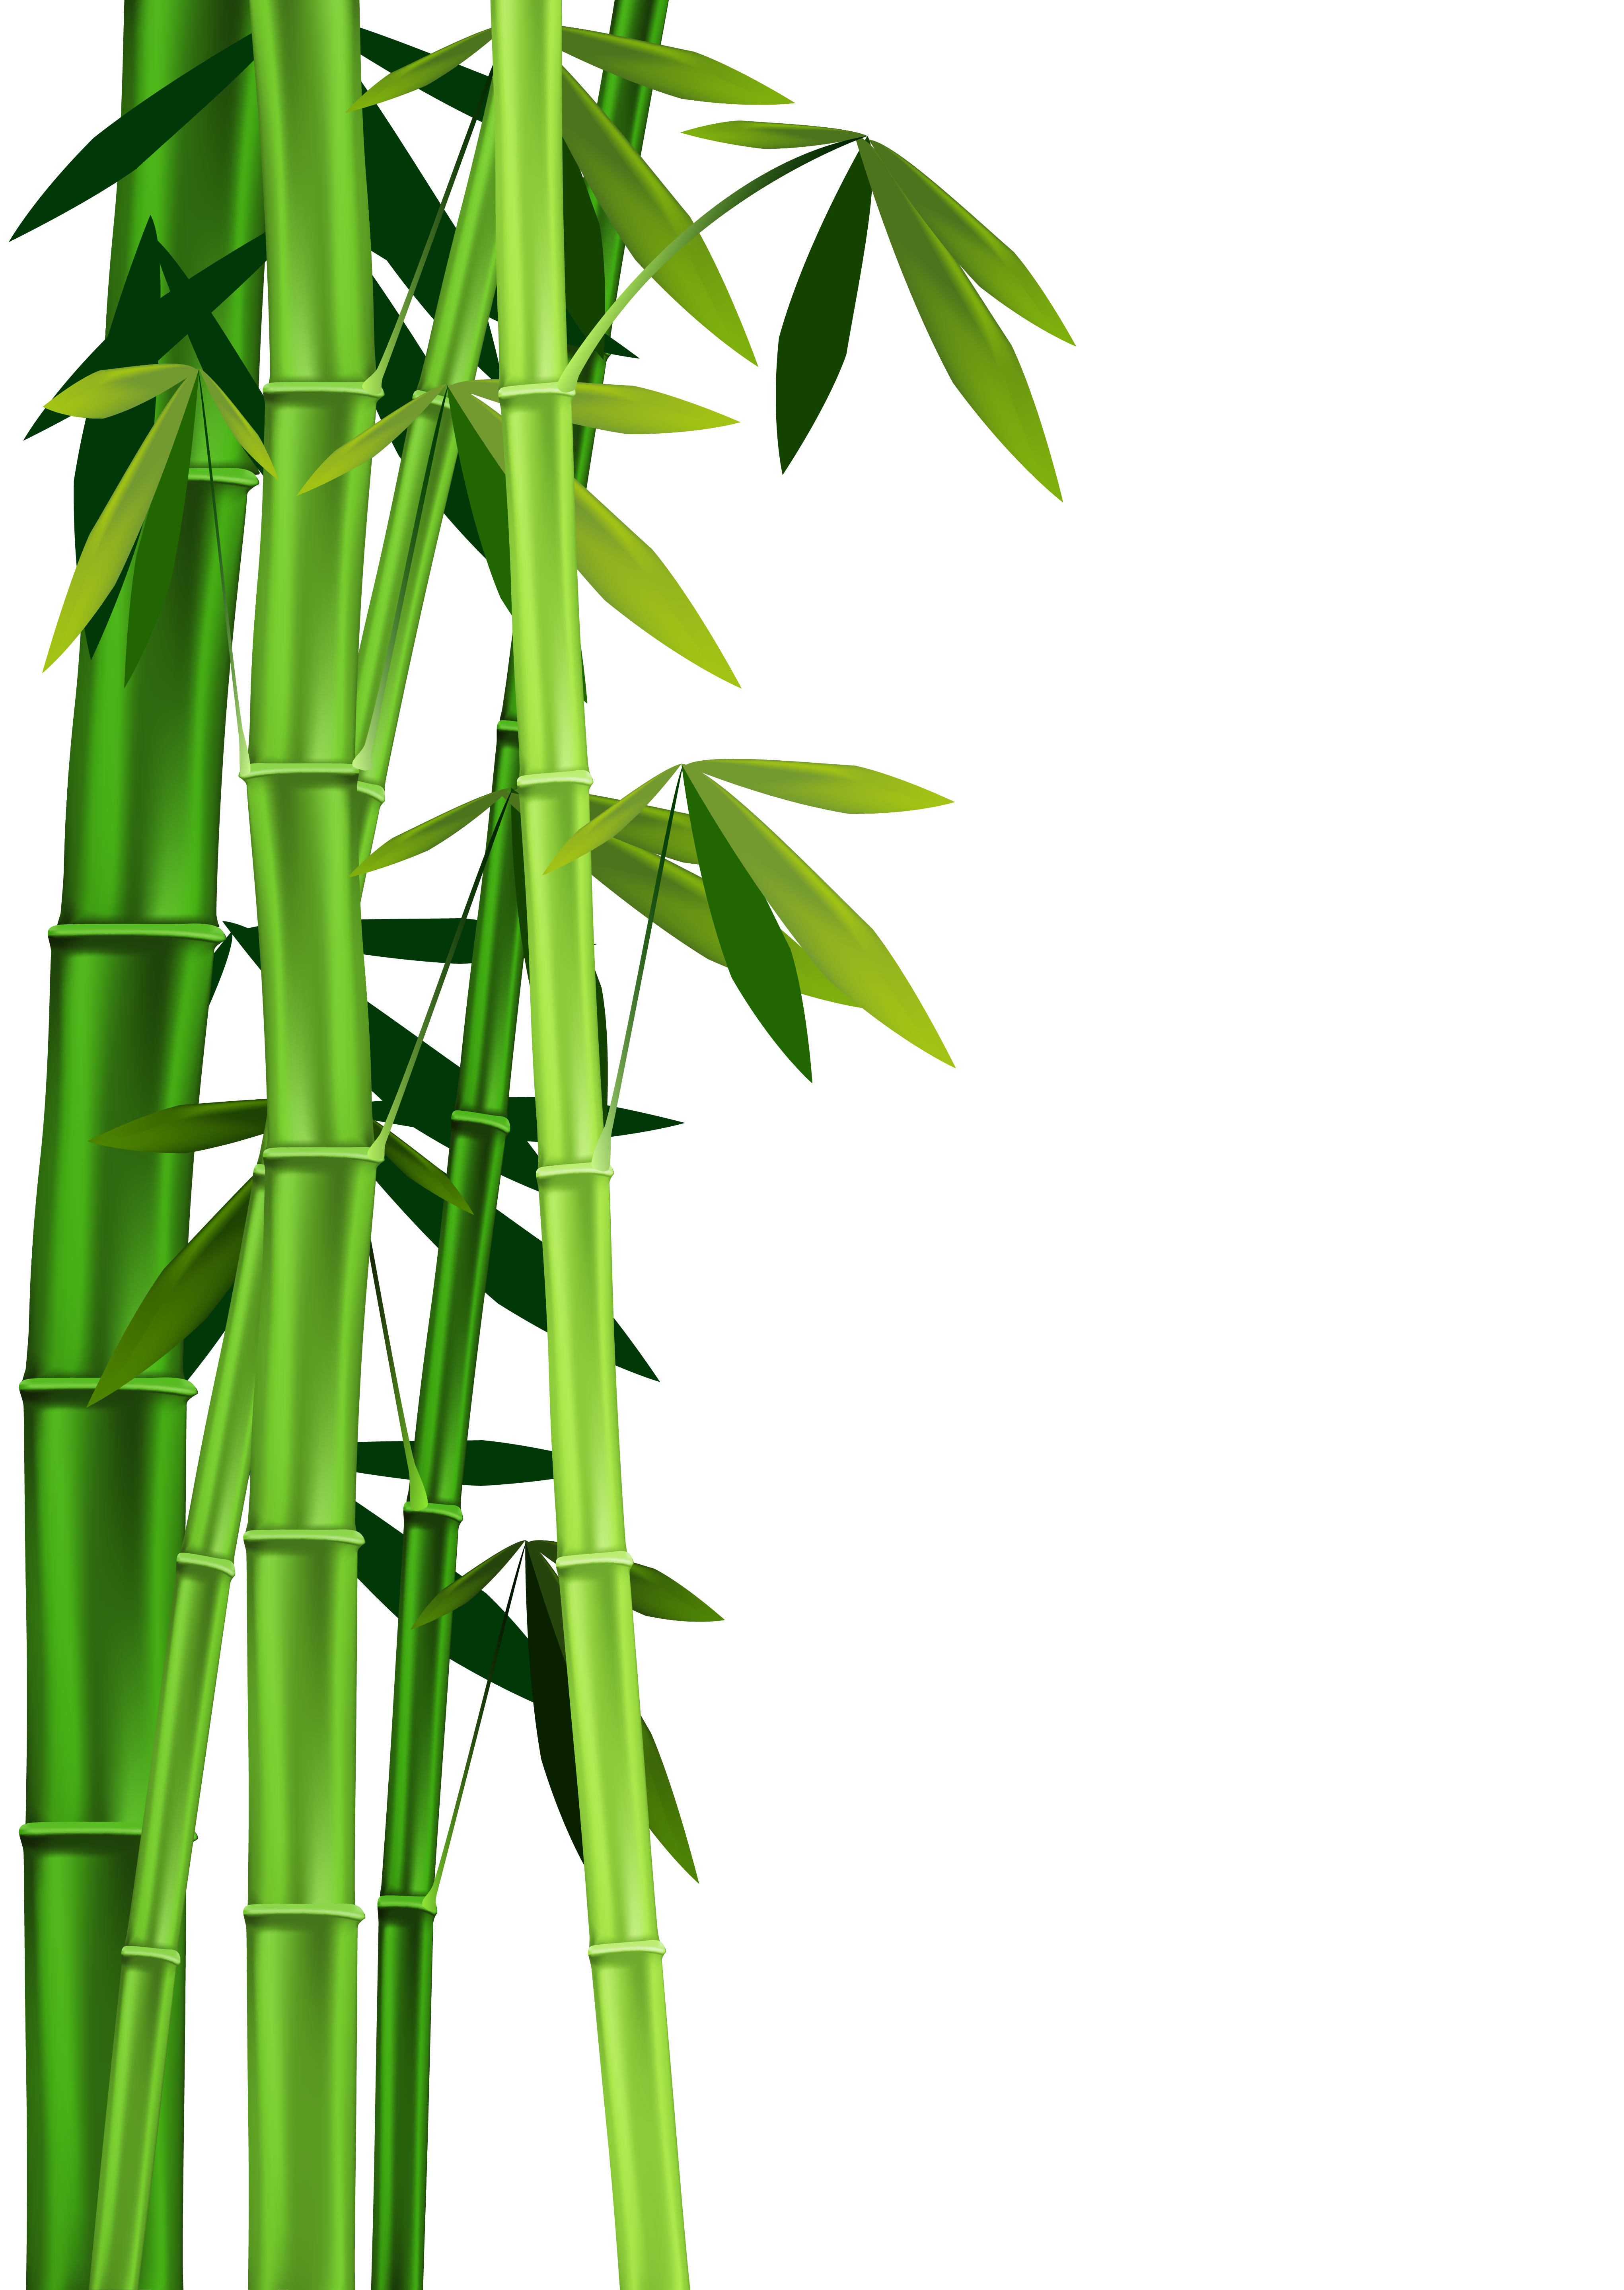 ... Bamboo Clipart - clipartall ...-... Bamboo Clipart - clipartall ...-17